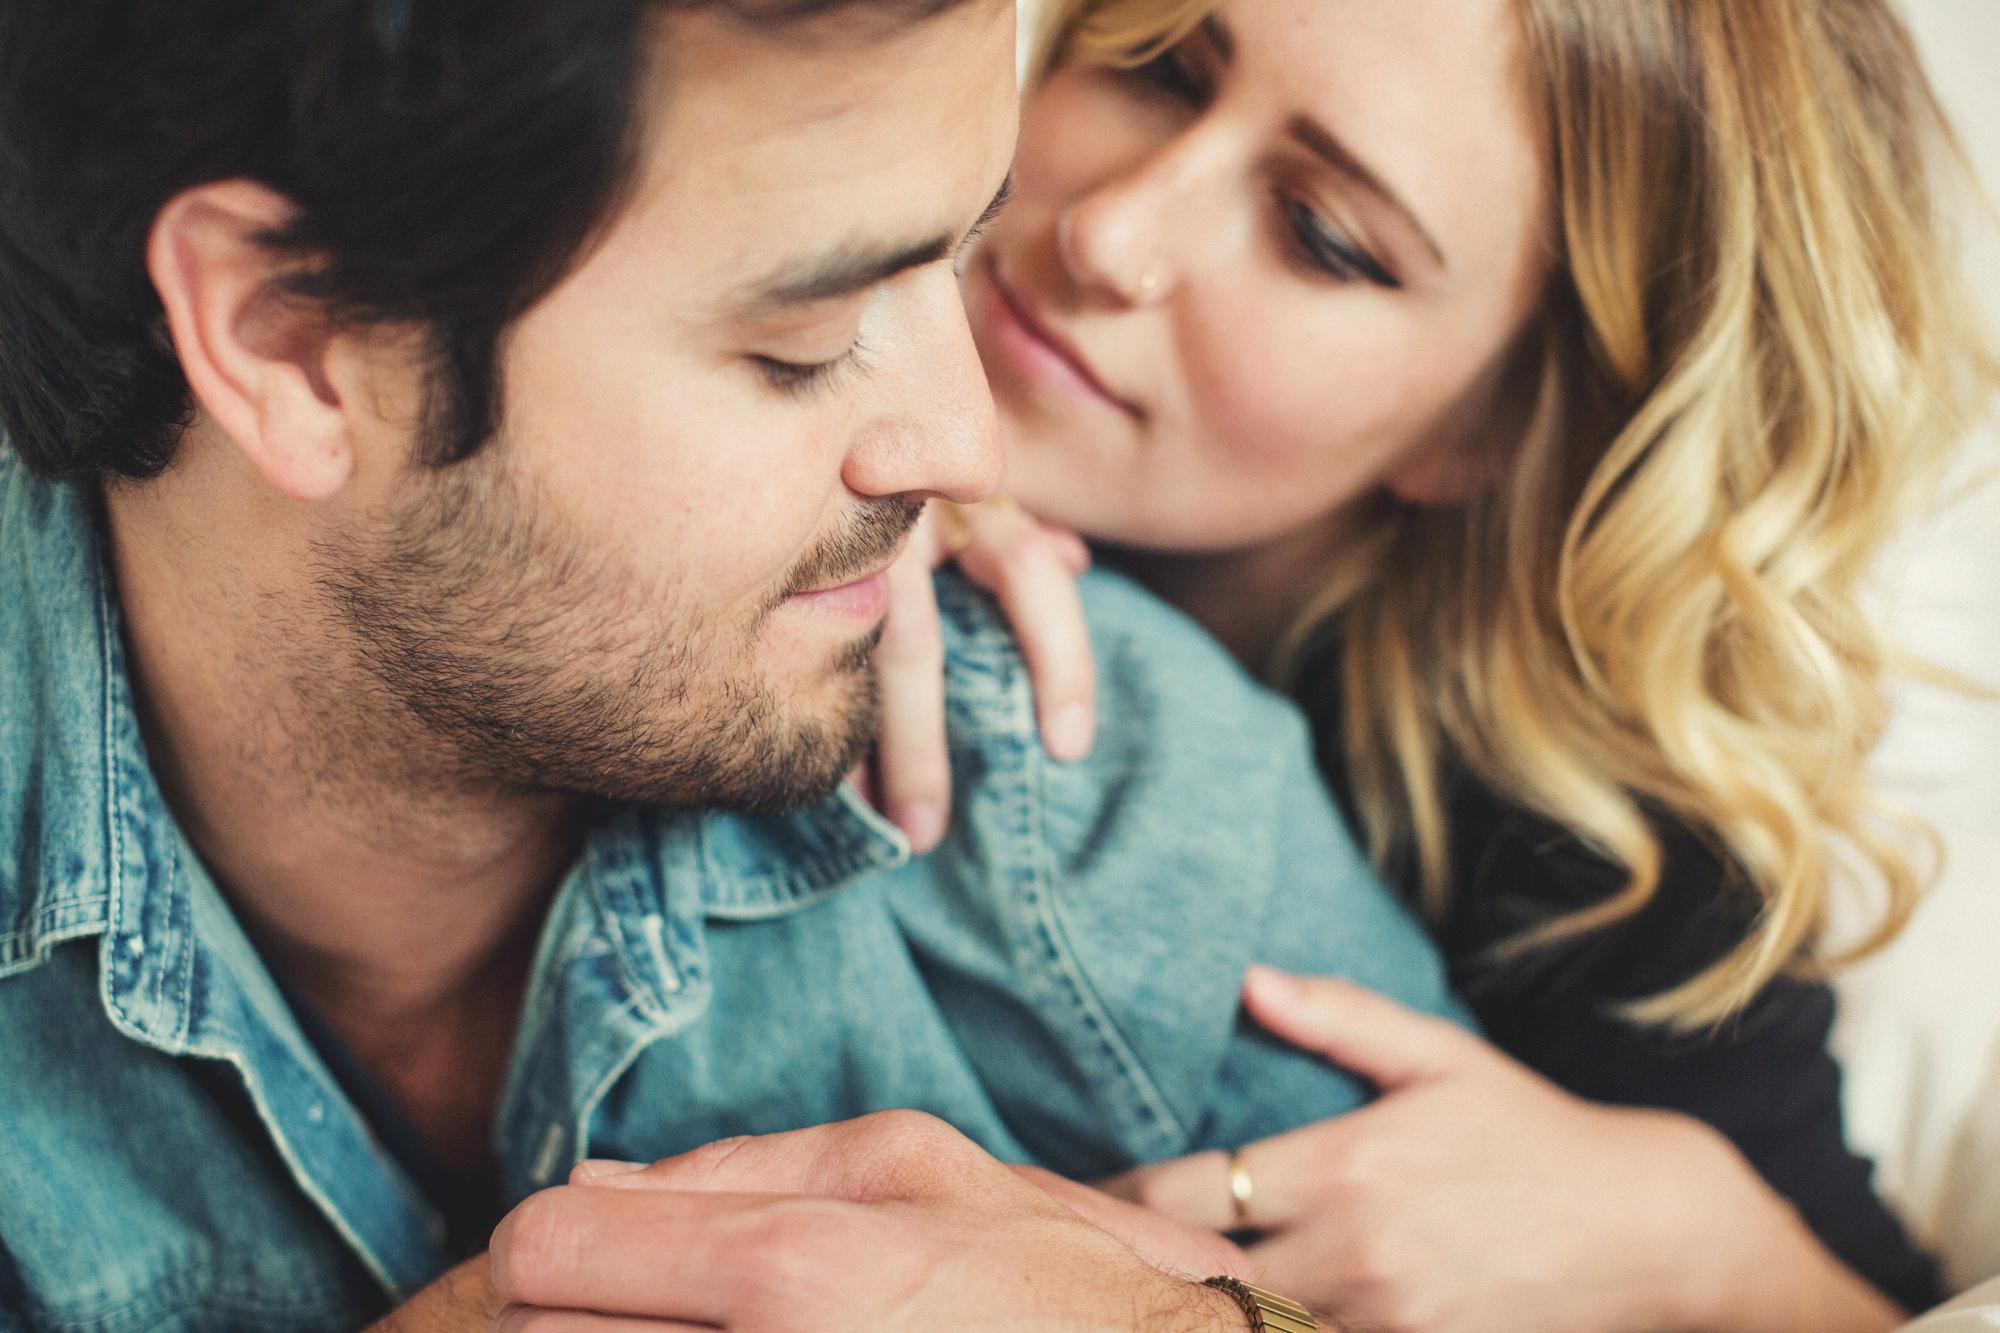 Intimate Couple Session@Anne-Claire Brun 61